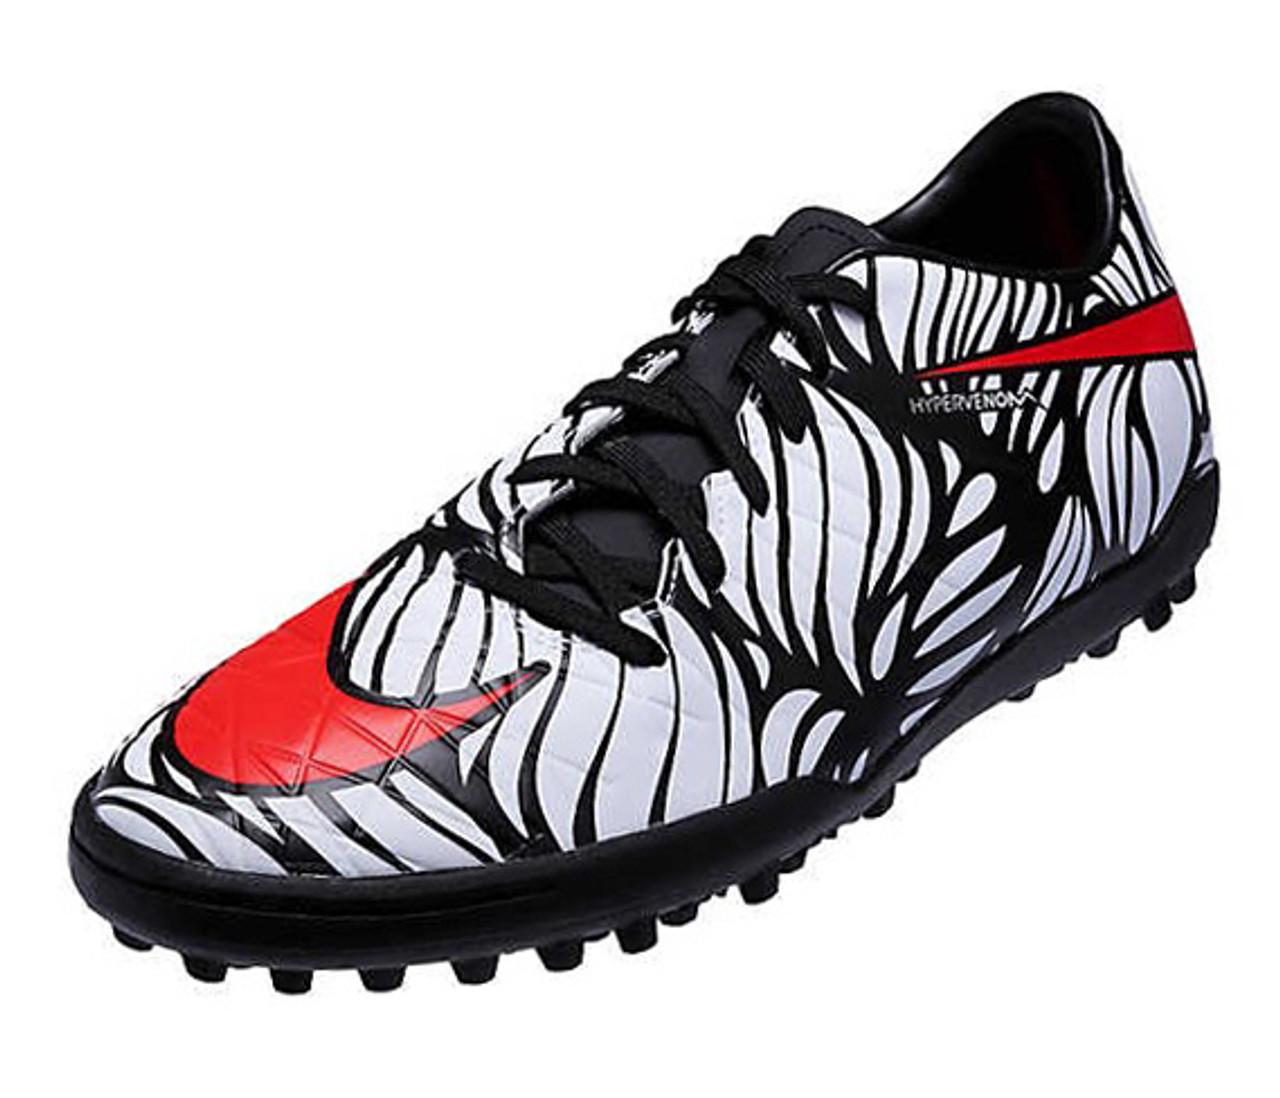 3532618230cc Nike Hypervenom Phelon II NJR TF - Black/Bright Crimson/White SD (111617